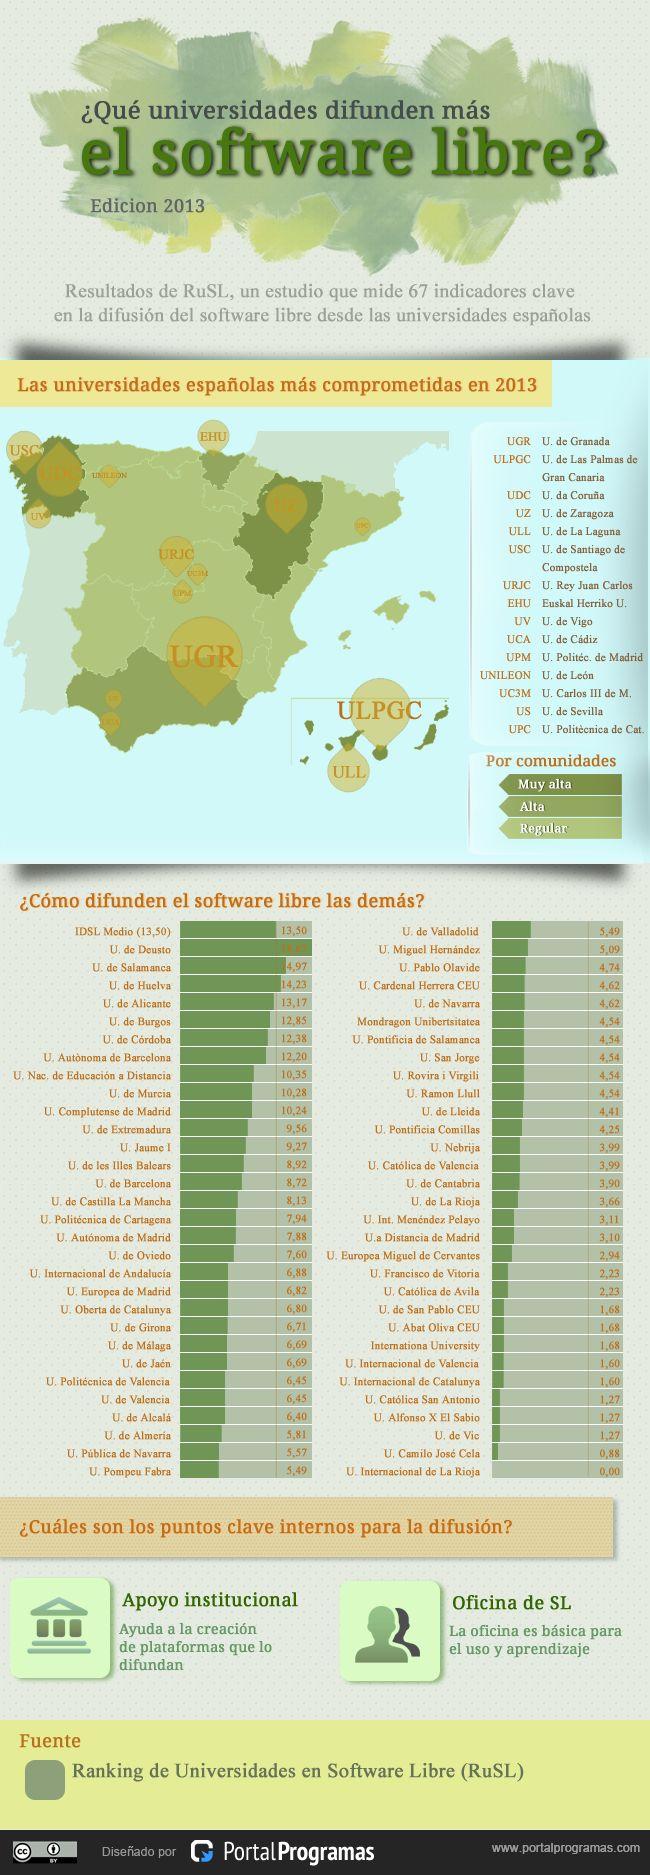 mejores universidades espanolas en software libre 2013